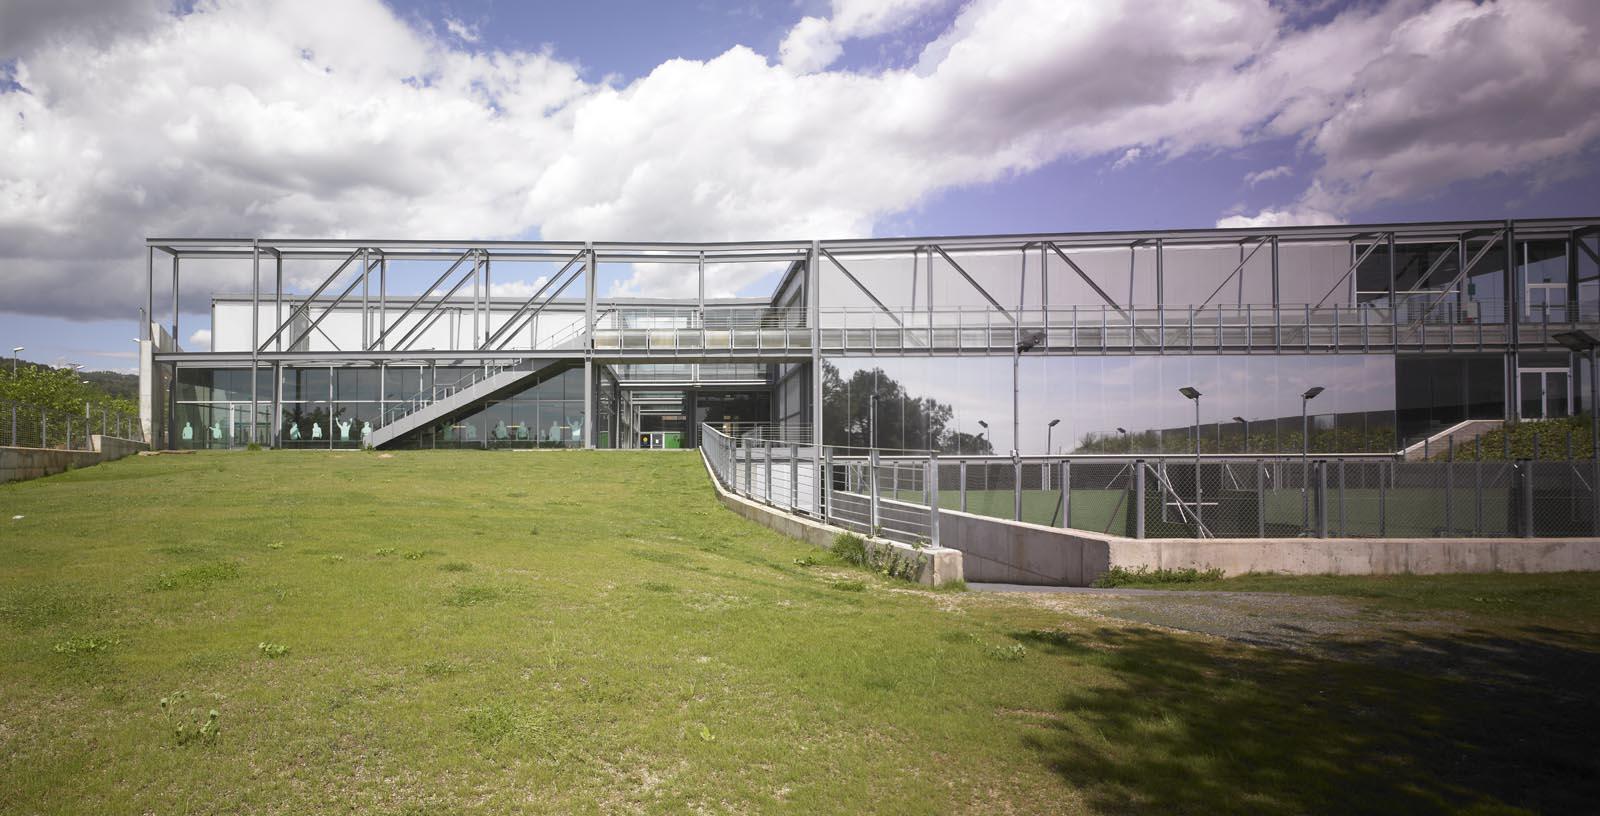 Pau_Gasol_Sports_Center-03-Architecture-IDOM-photo-Eugeni_Pons